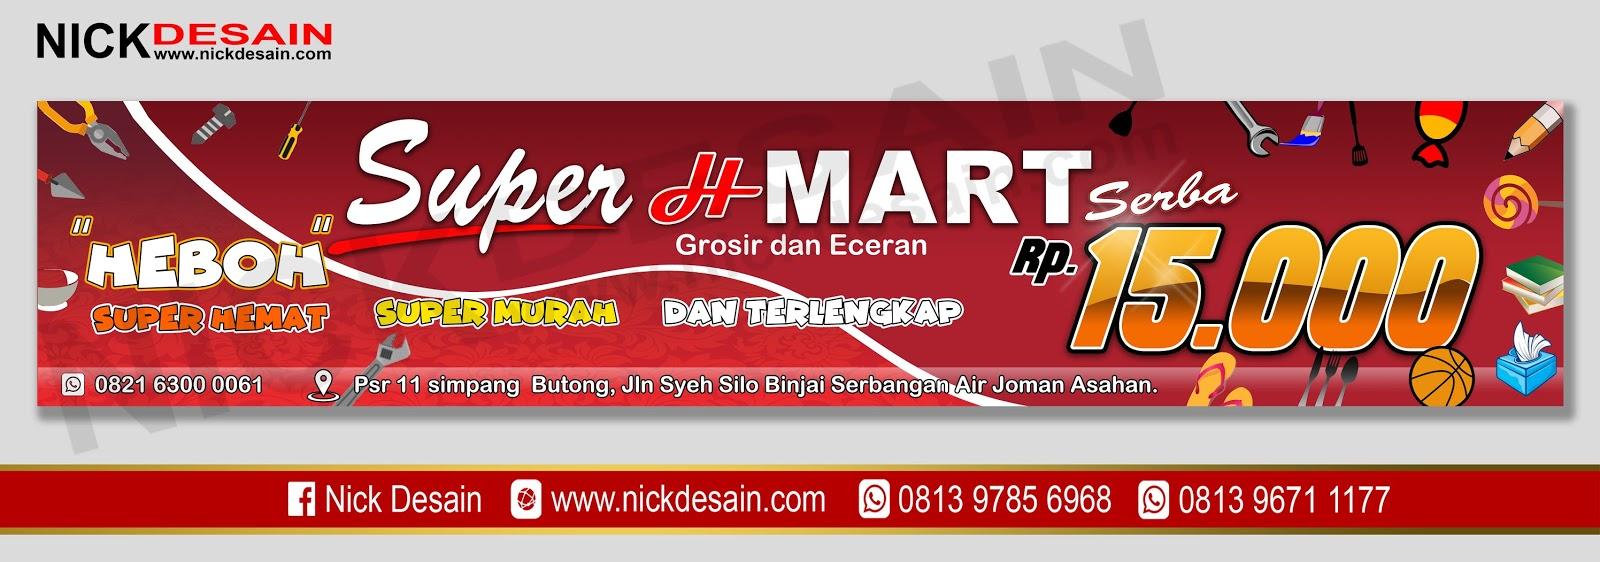 Contoh Desain banner Spanduk Super H Mart Toserba ...